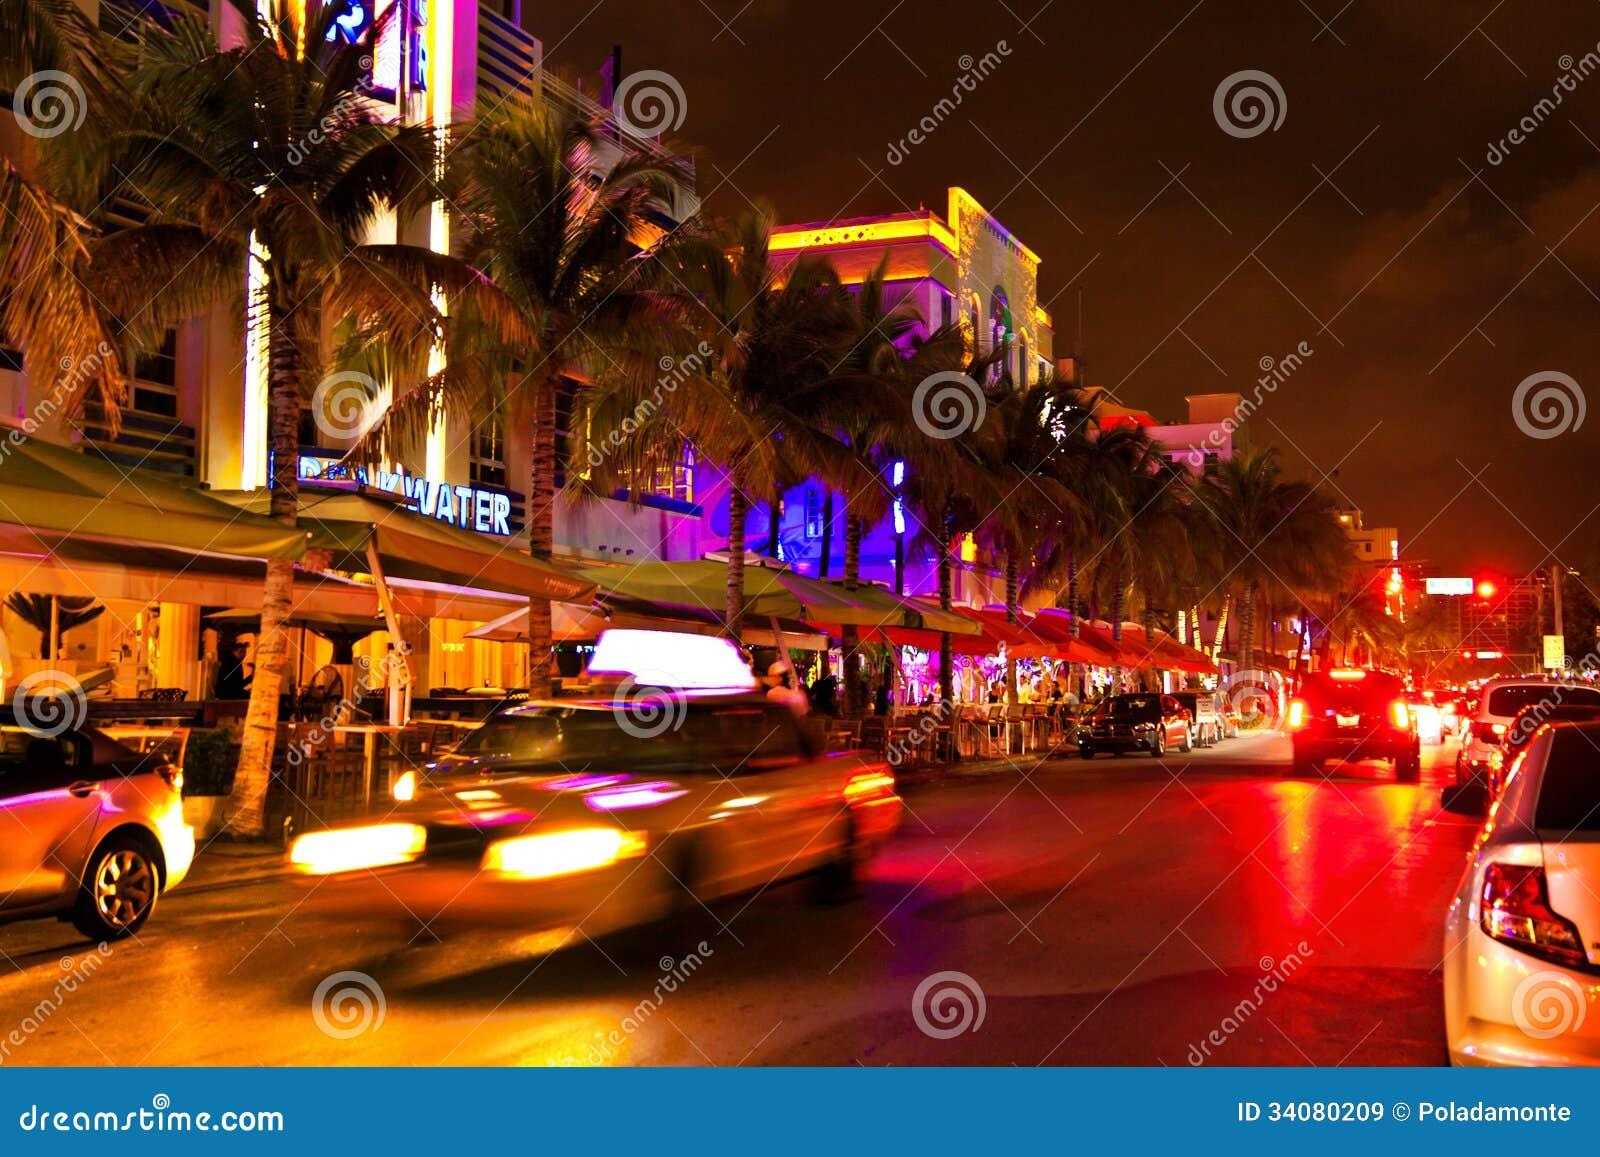 Drive Scene At Night Lights, Miami Beach, Florida. Editorial Stock Image